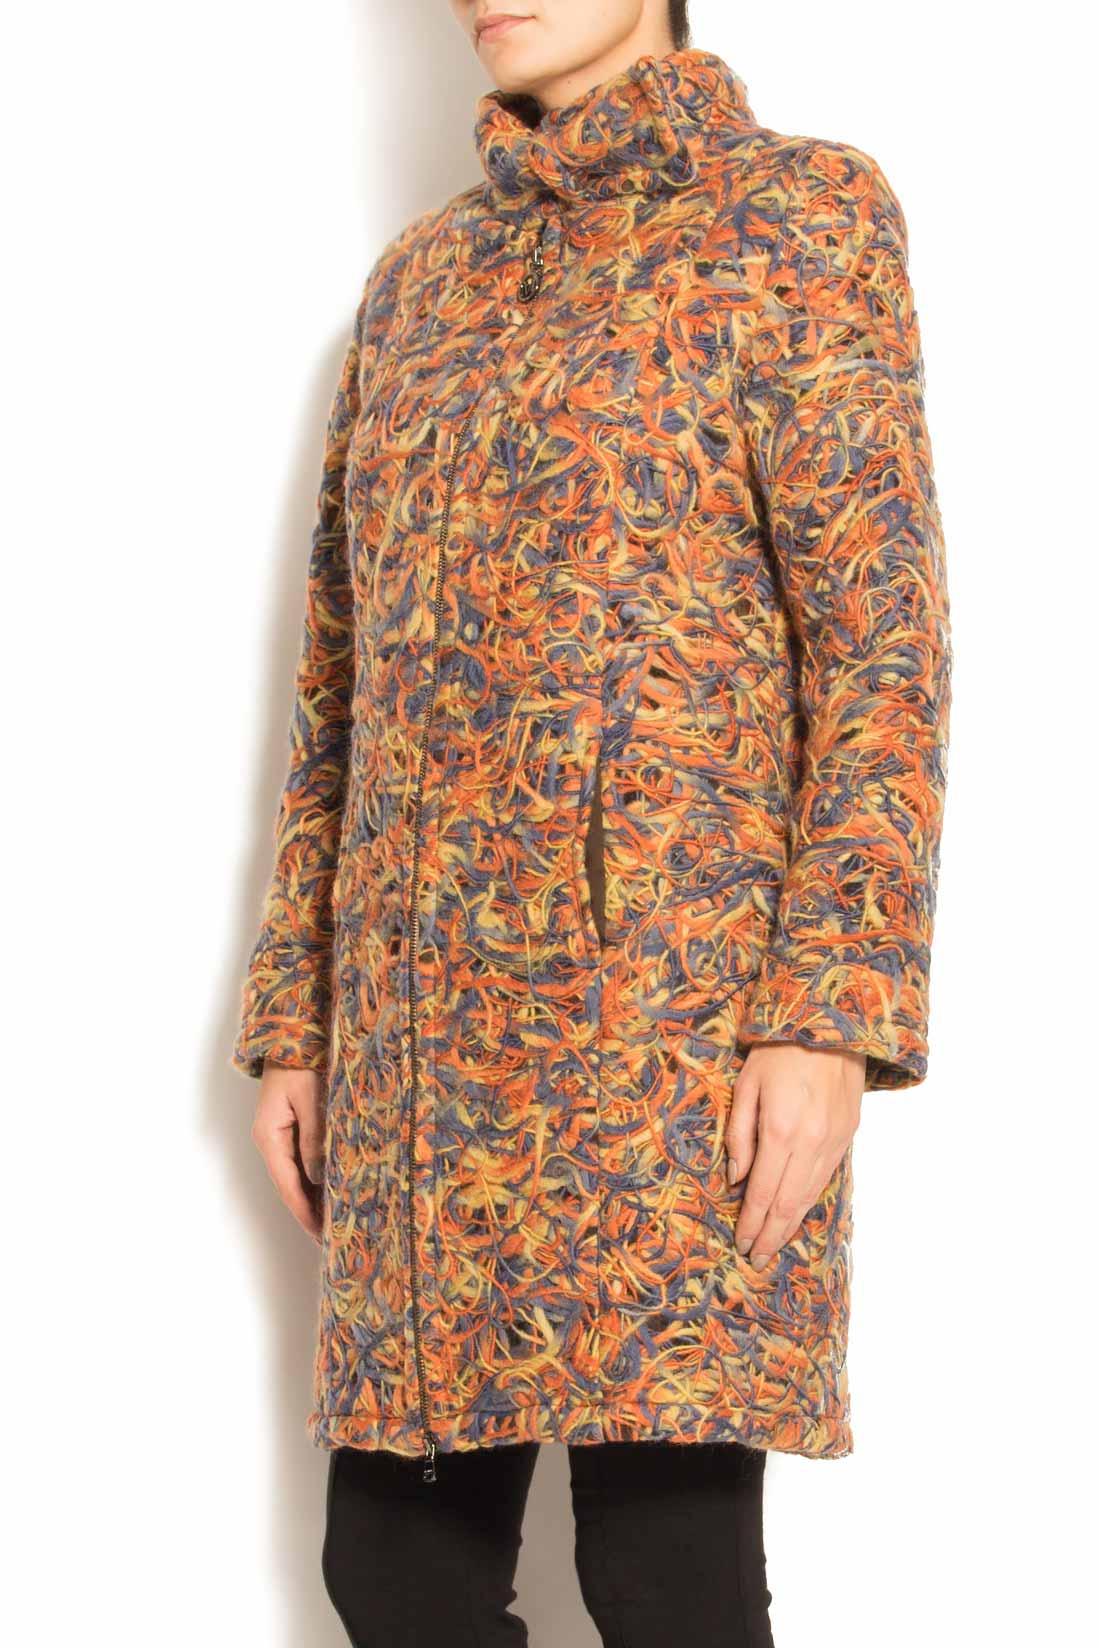 Palton din lana cu buzunare laterale Arina Varga imagine 1